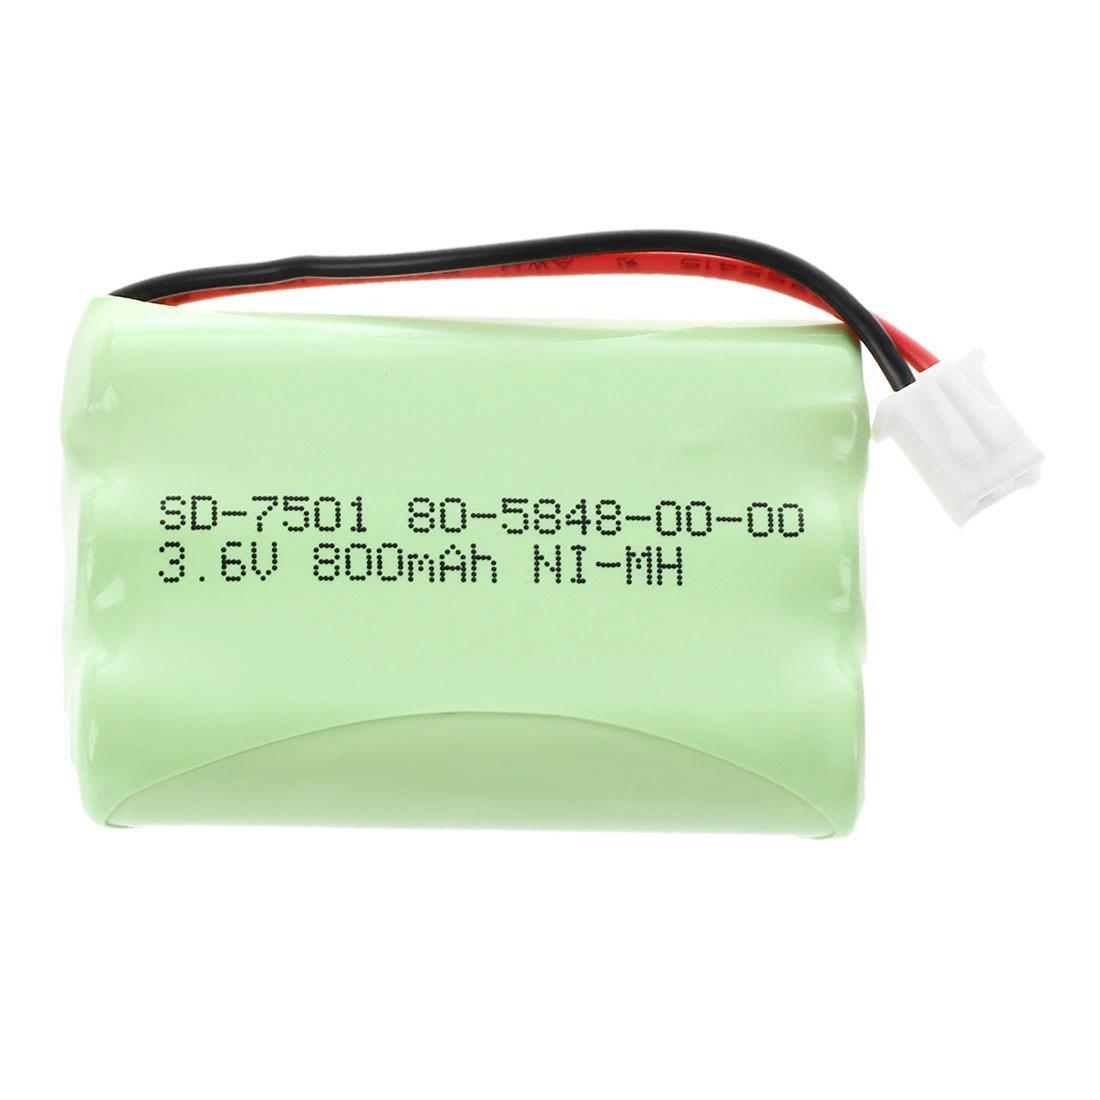 Cordless Phone Battery 3.6V 800mAh NiMH for Southern Telecom MC1000 MC1000HS, Vtech 80-0099-00-00 8900990000 80-1323-00-00 891